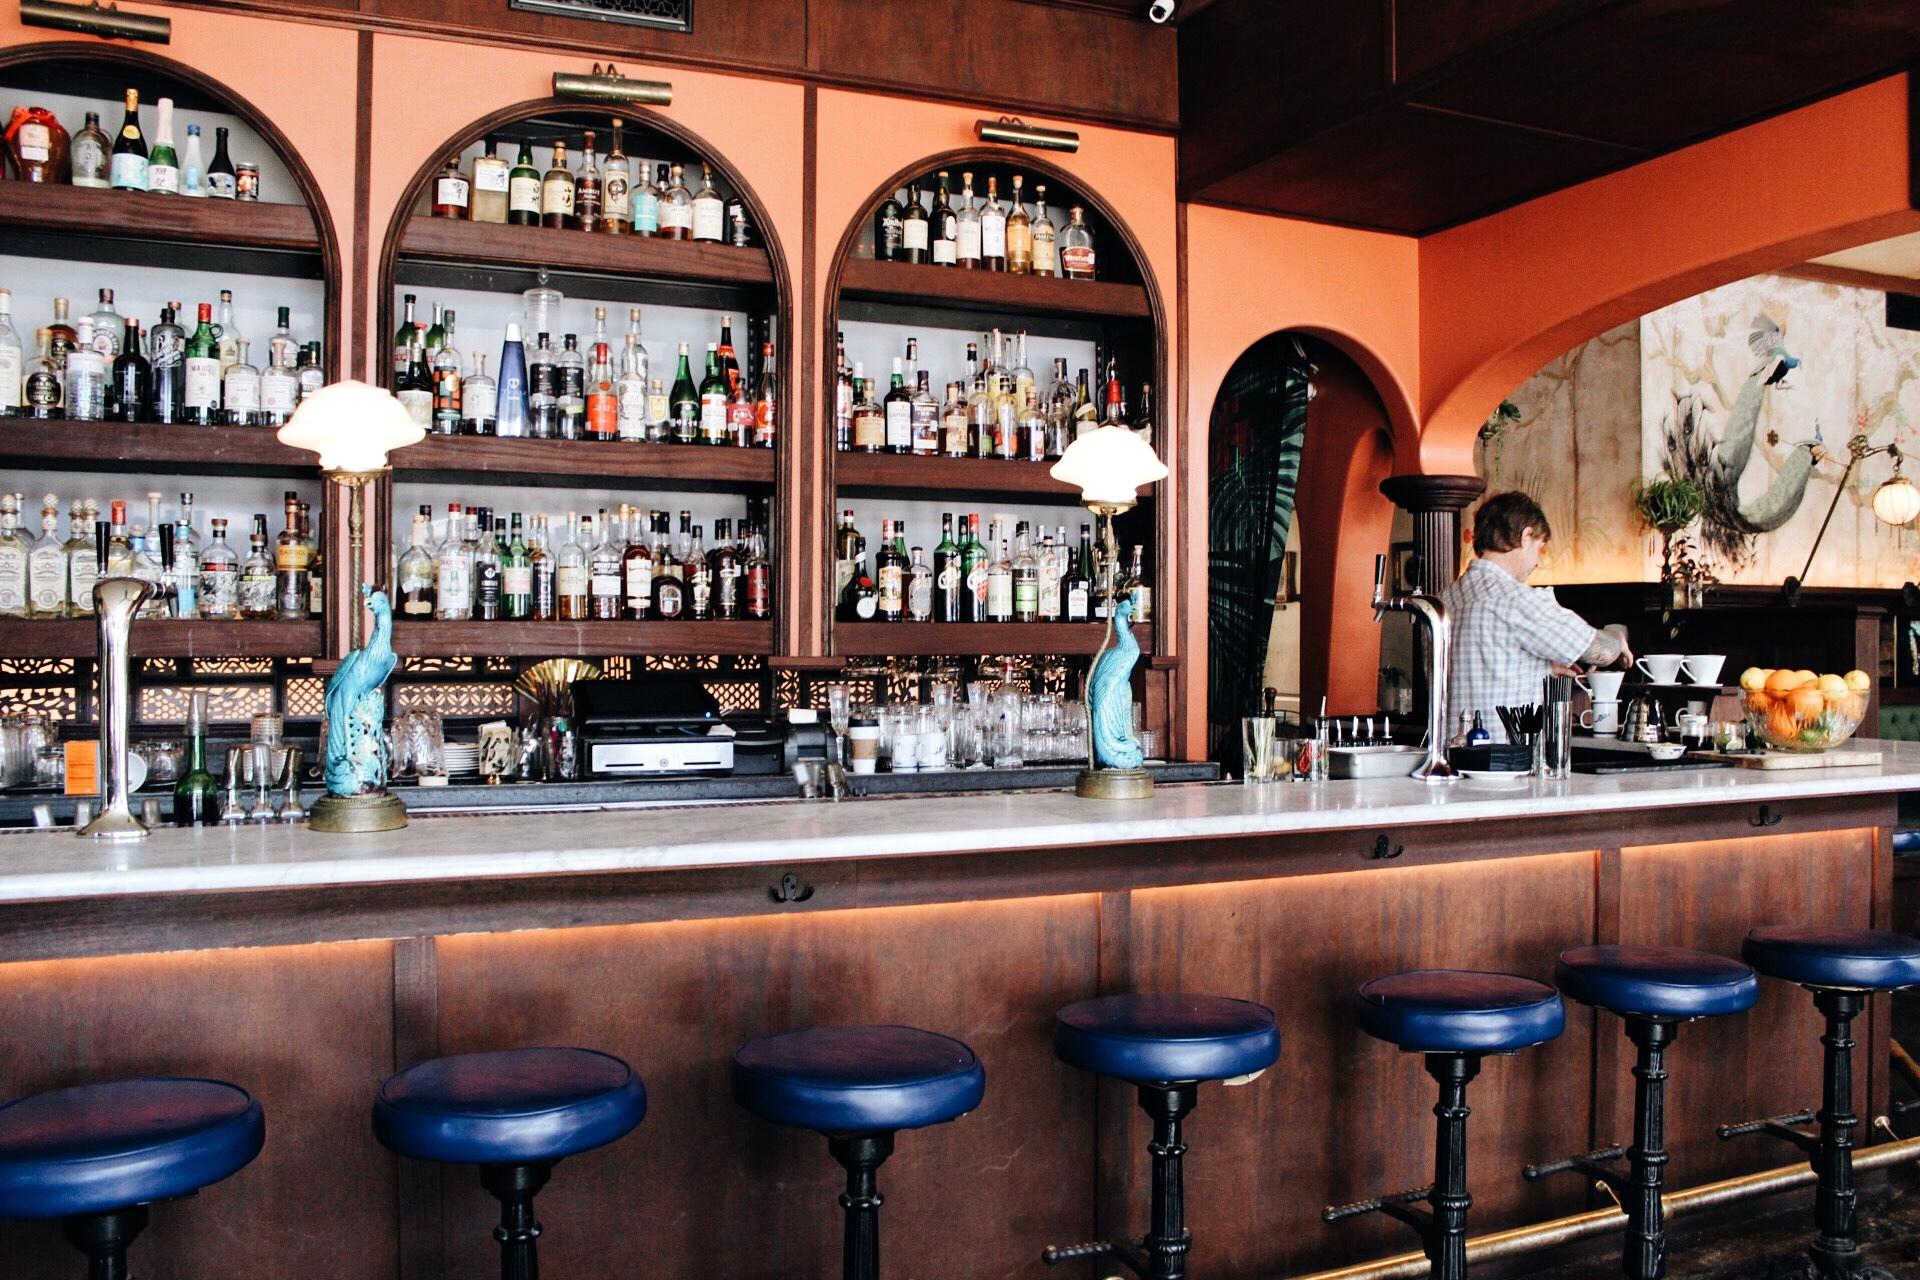 Places to Take Pictures in Austin - www.tresgigi.com